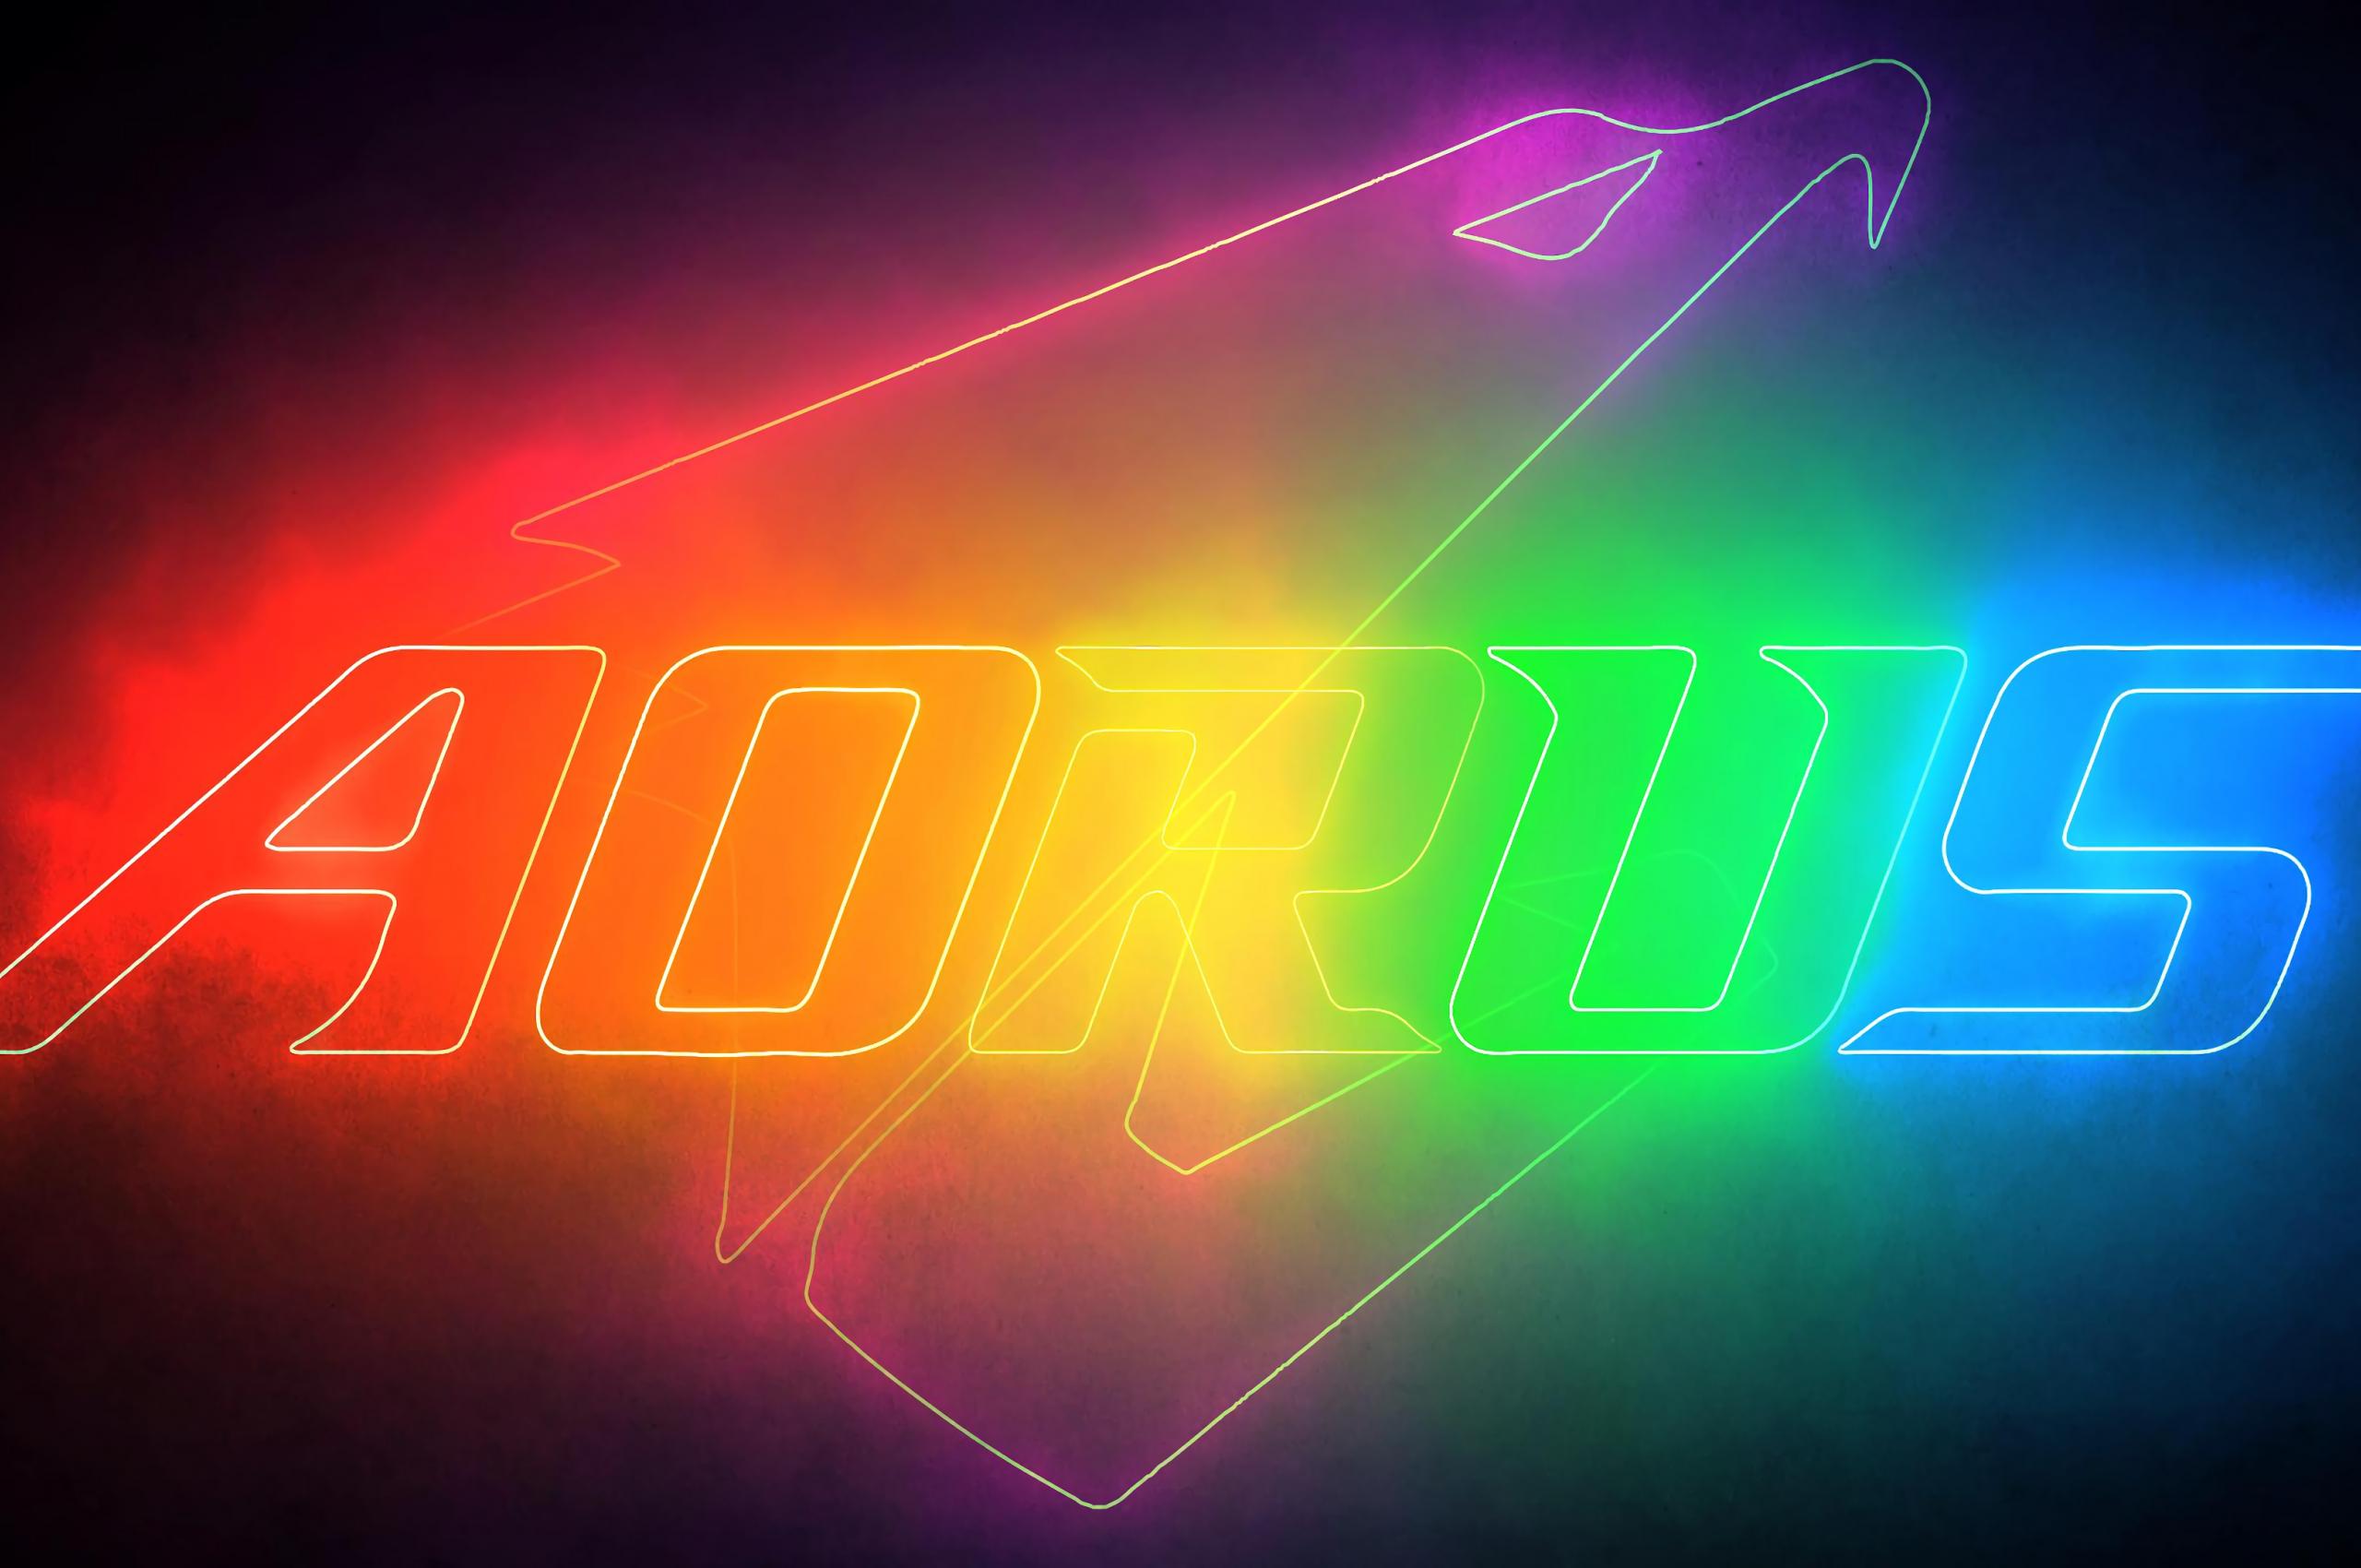 Metroid samus rgb live wallpaper free. Free download AORUS Logo RGB Neon 4K 17168 3840x2160 for ...